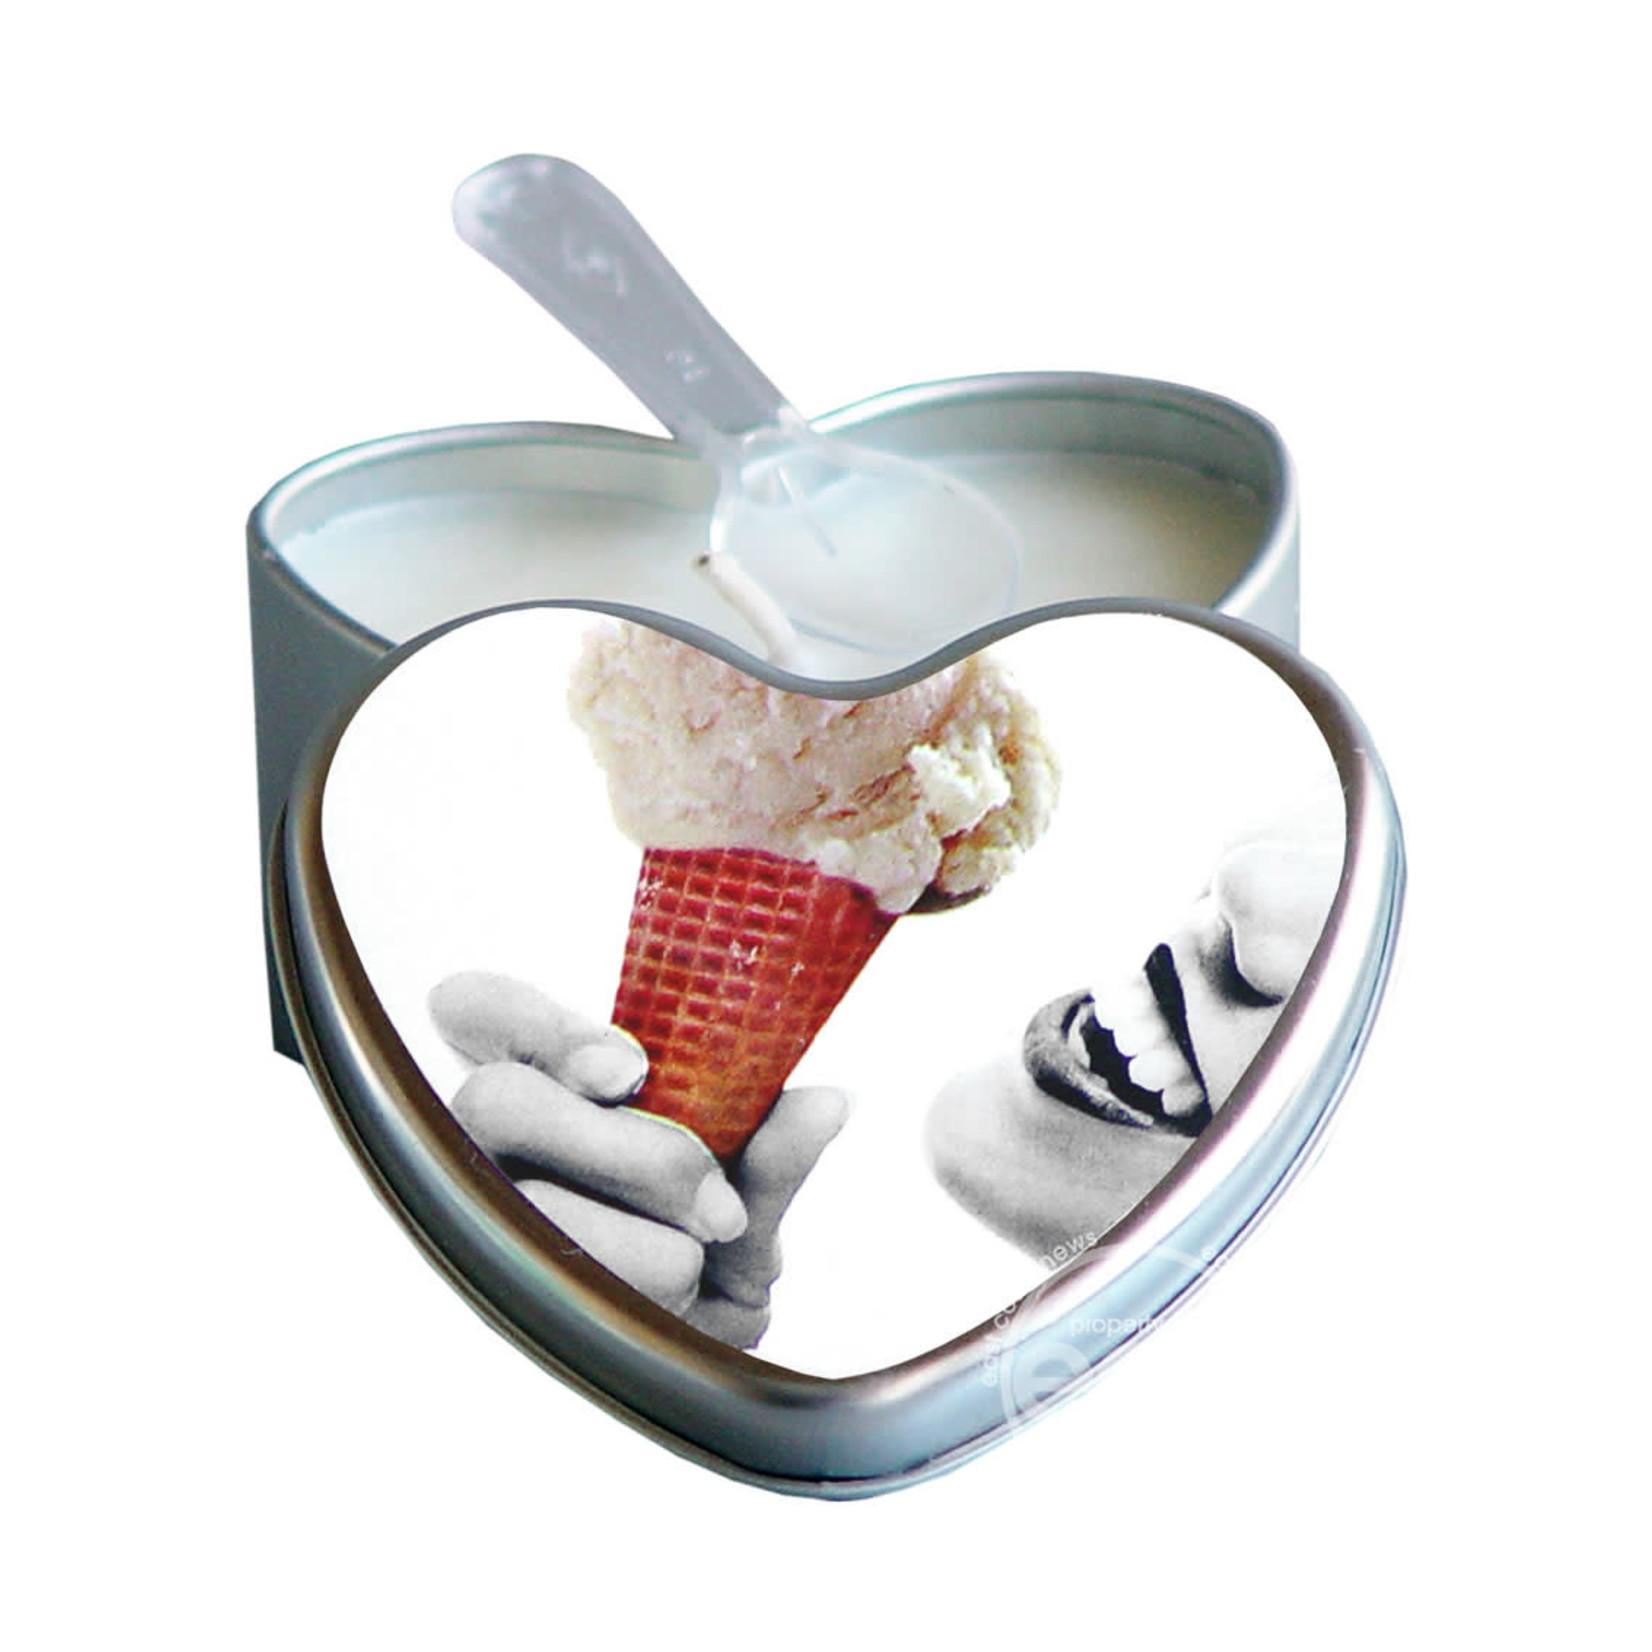 Earthly Body Heart-Shaped Hemp Seed Edible Massage Candle Vanilla 4oz